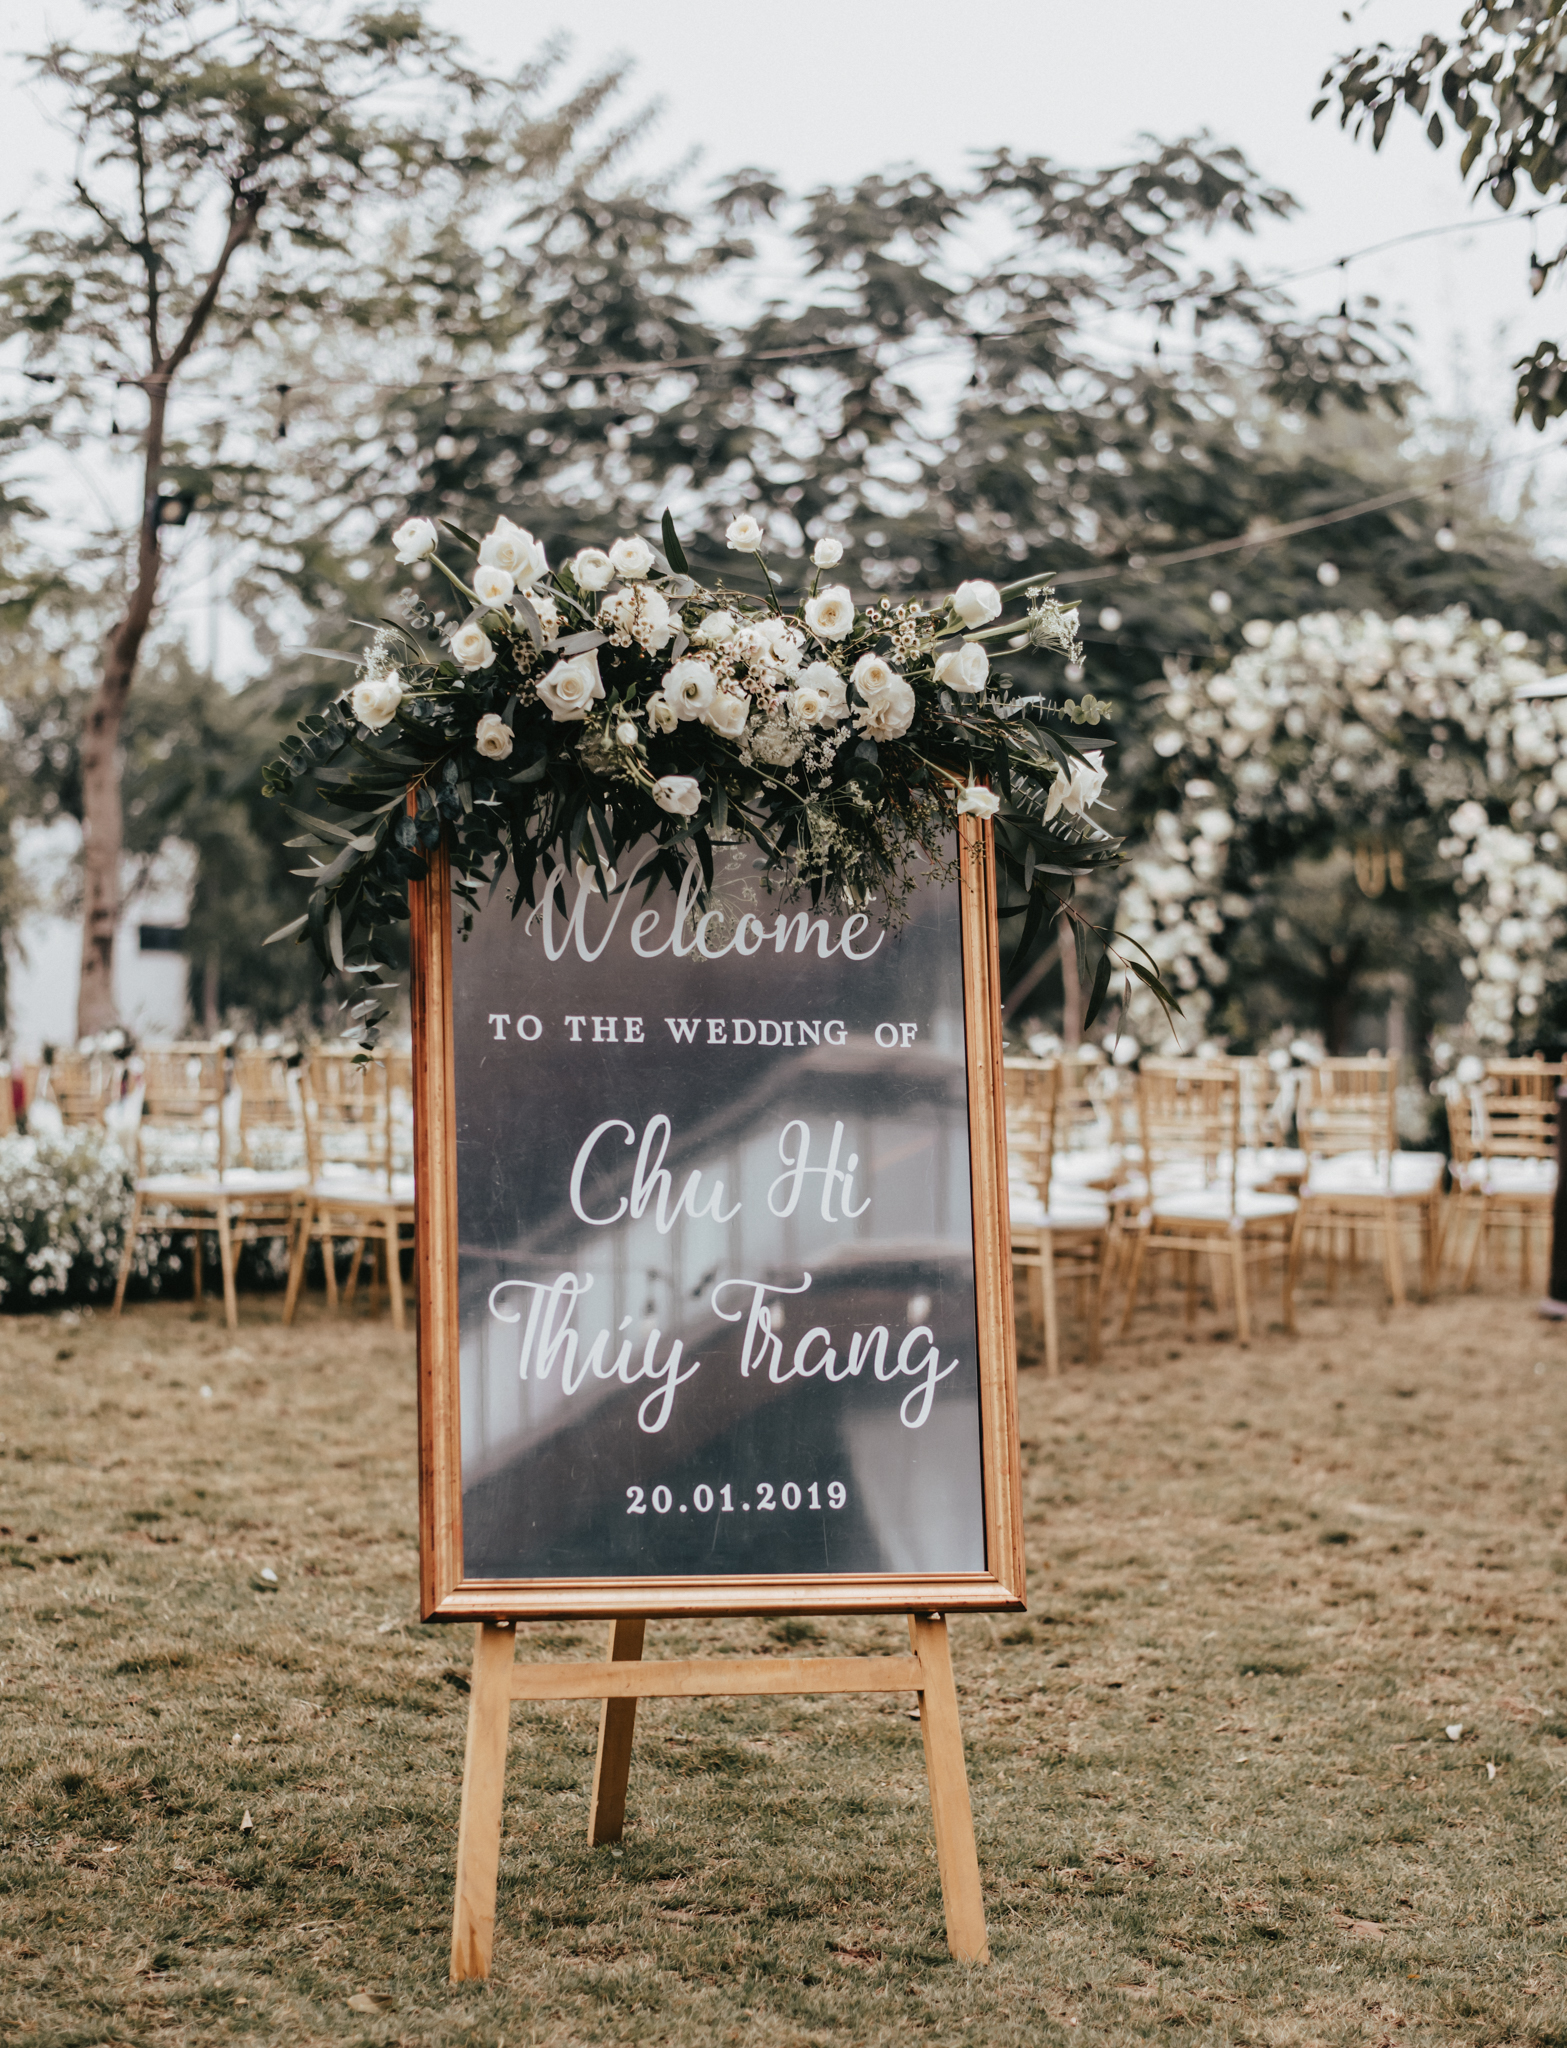 JWMarriott Ha Noi Intimate Wedding of Trang Hi well captured by Hipster Wedding Vietnam Wedding Photographer-3874.jpg